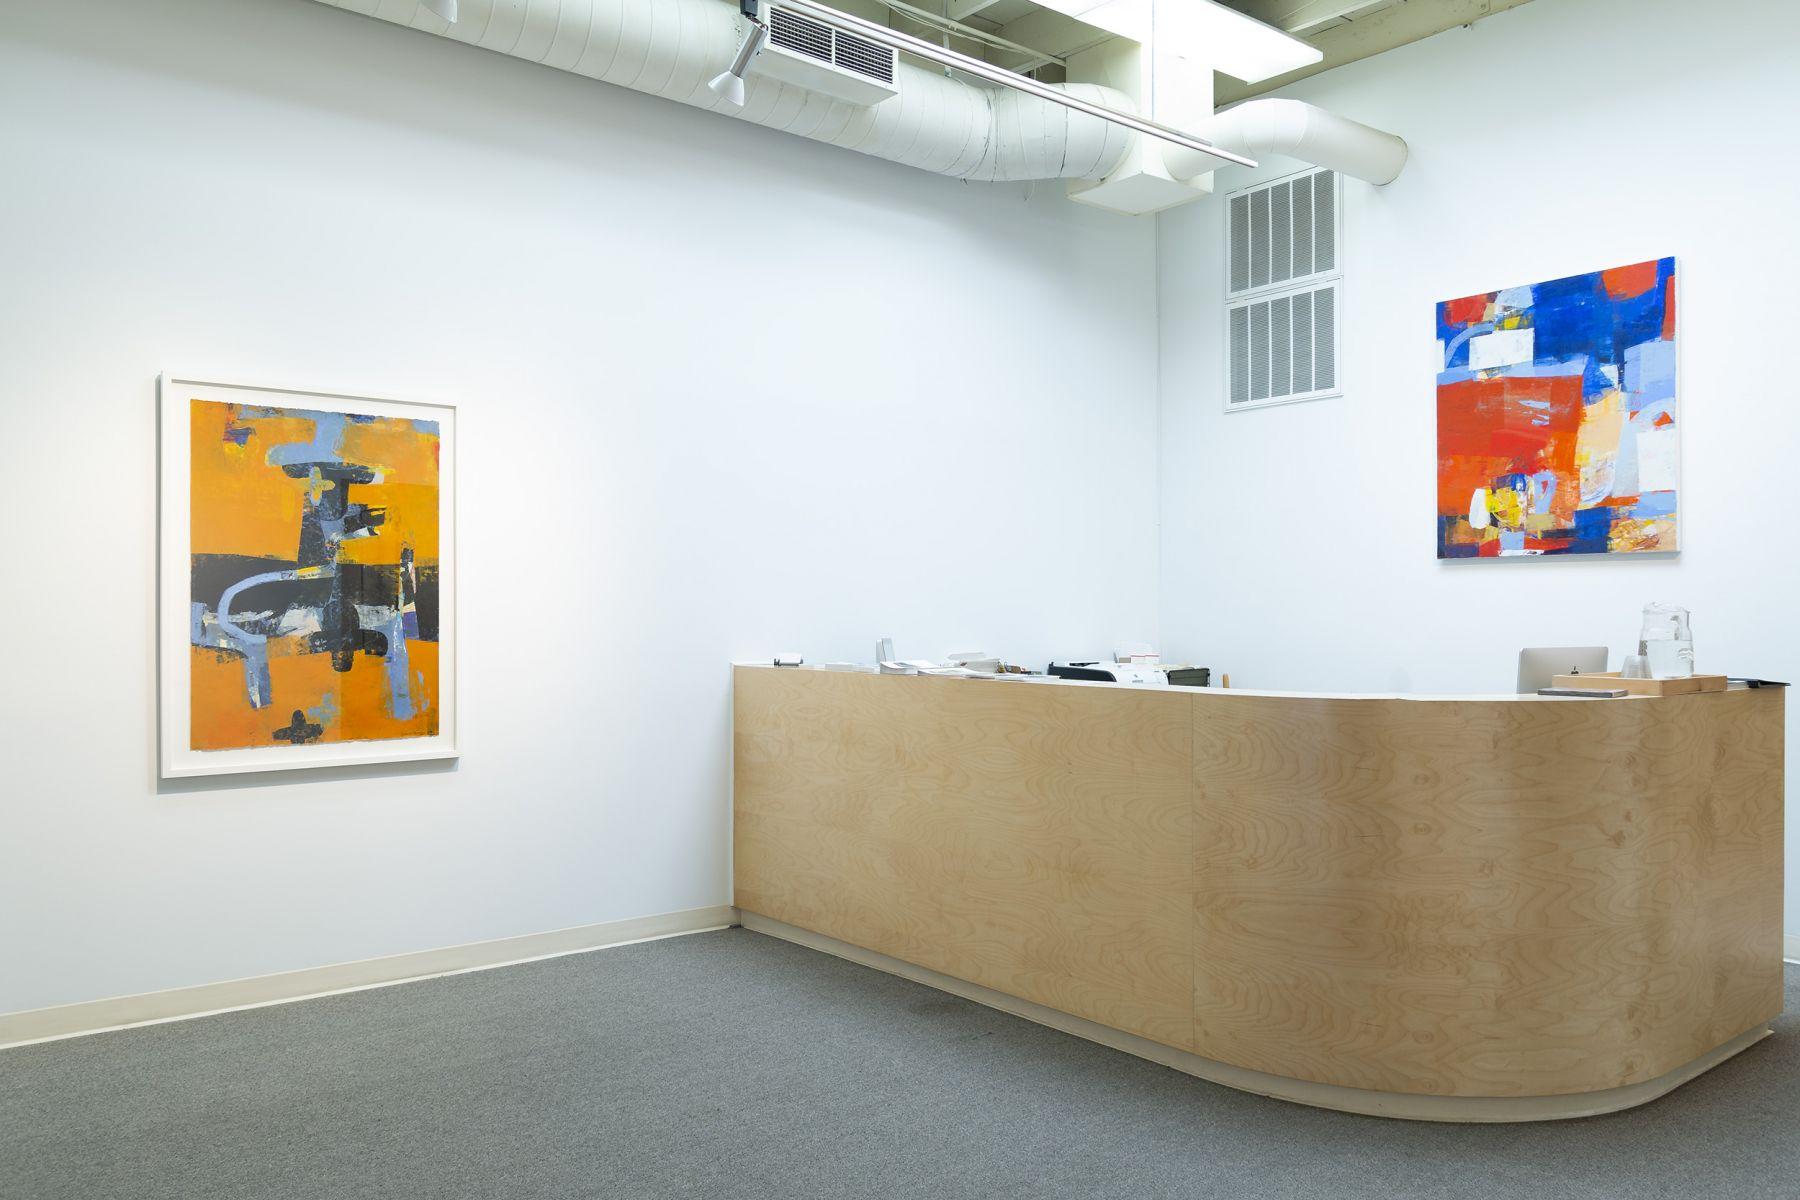 G. Lewis Clevenger - Minimis/Maximus - June 2019 - Installation View 06